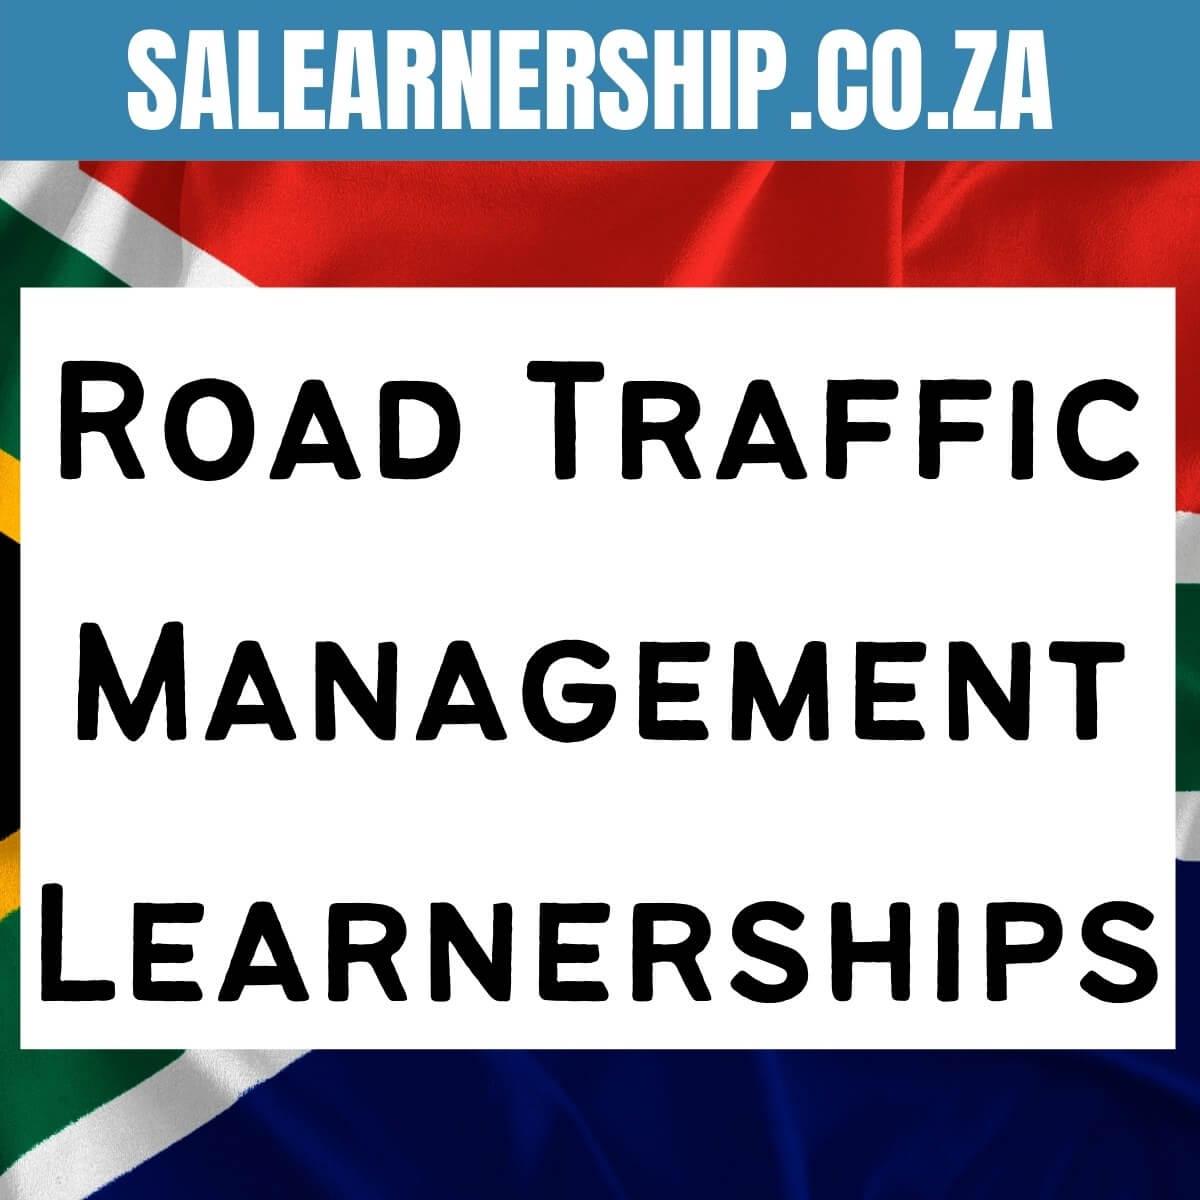 road traffic management learnerships